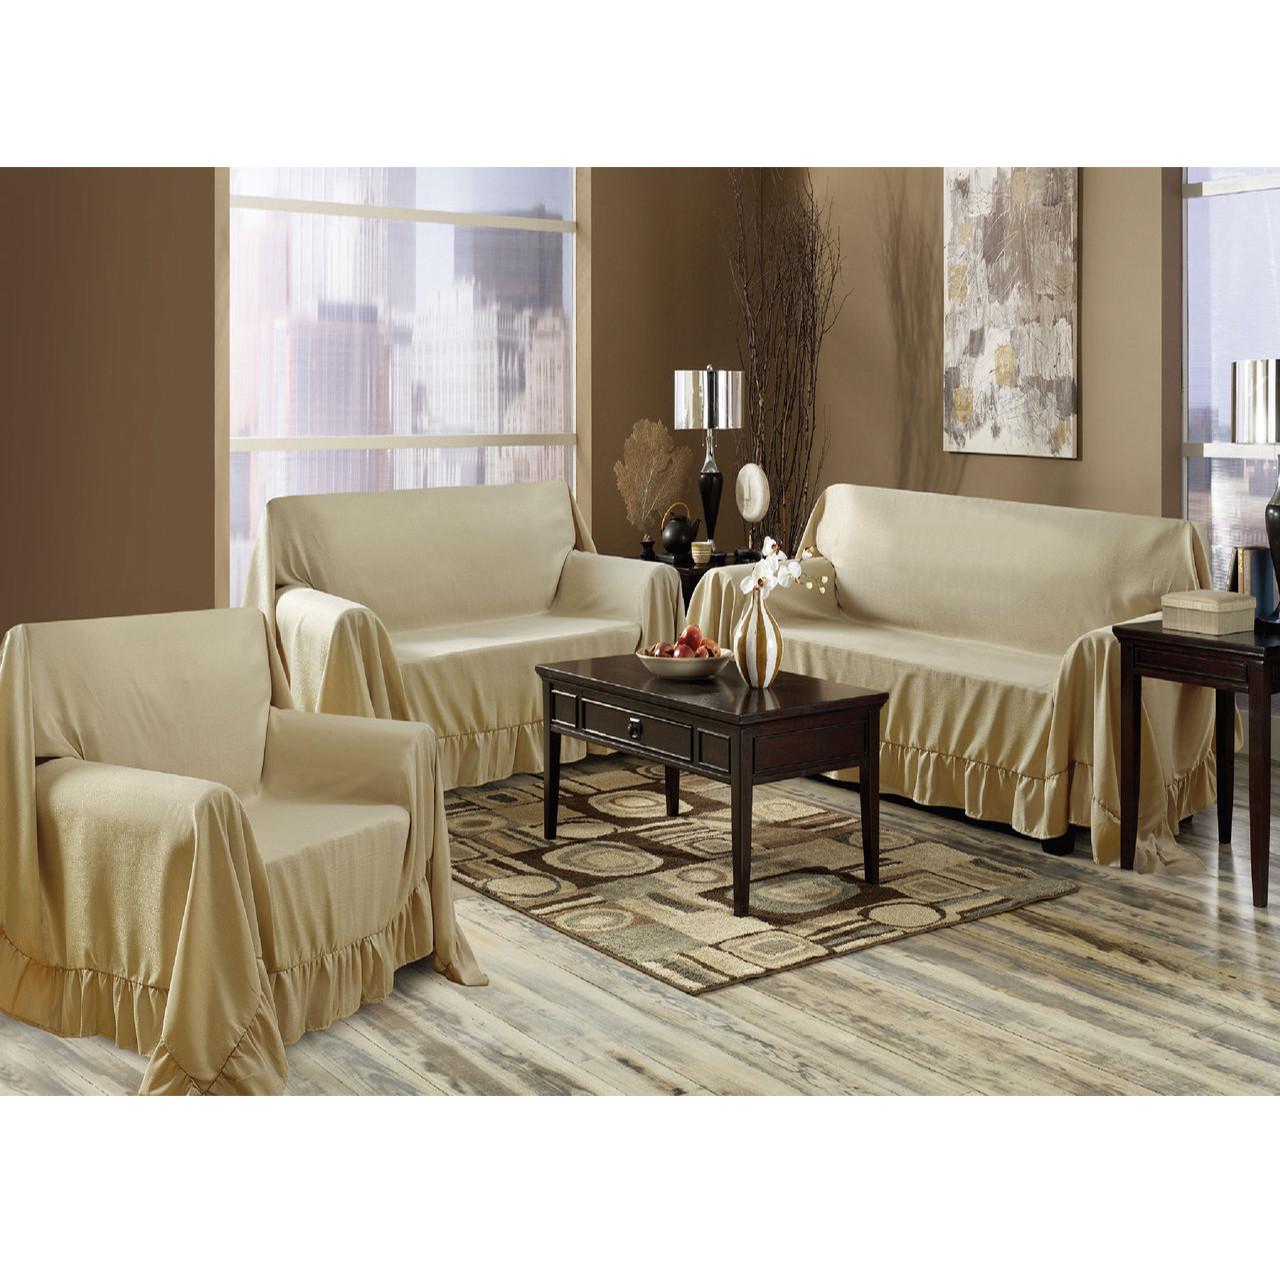 Venice 3 Piece Sofa, Loveseat, Chair Protector Throw Cover Set